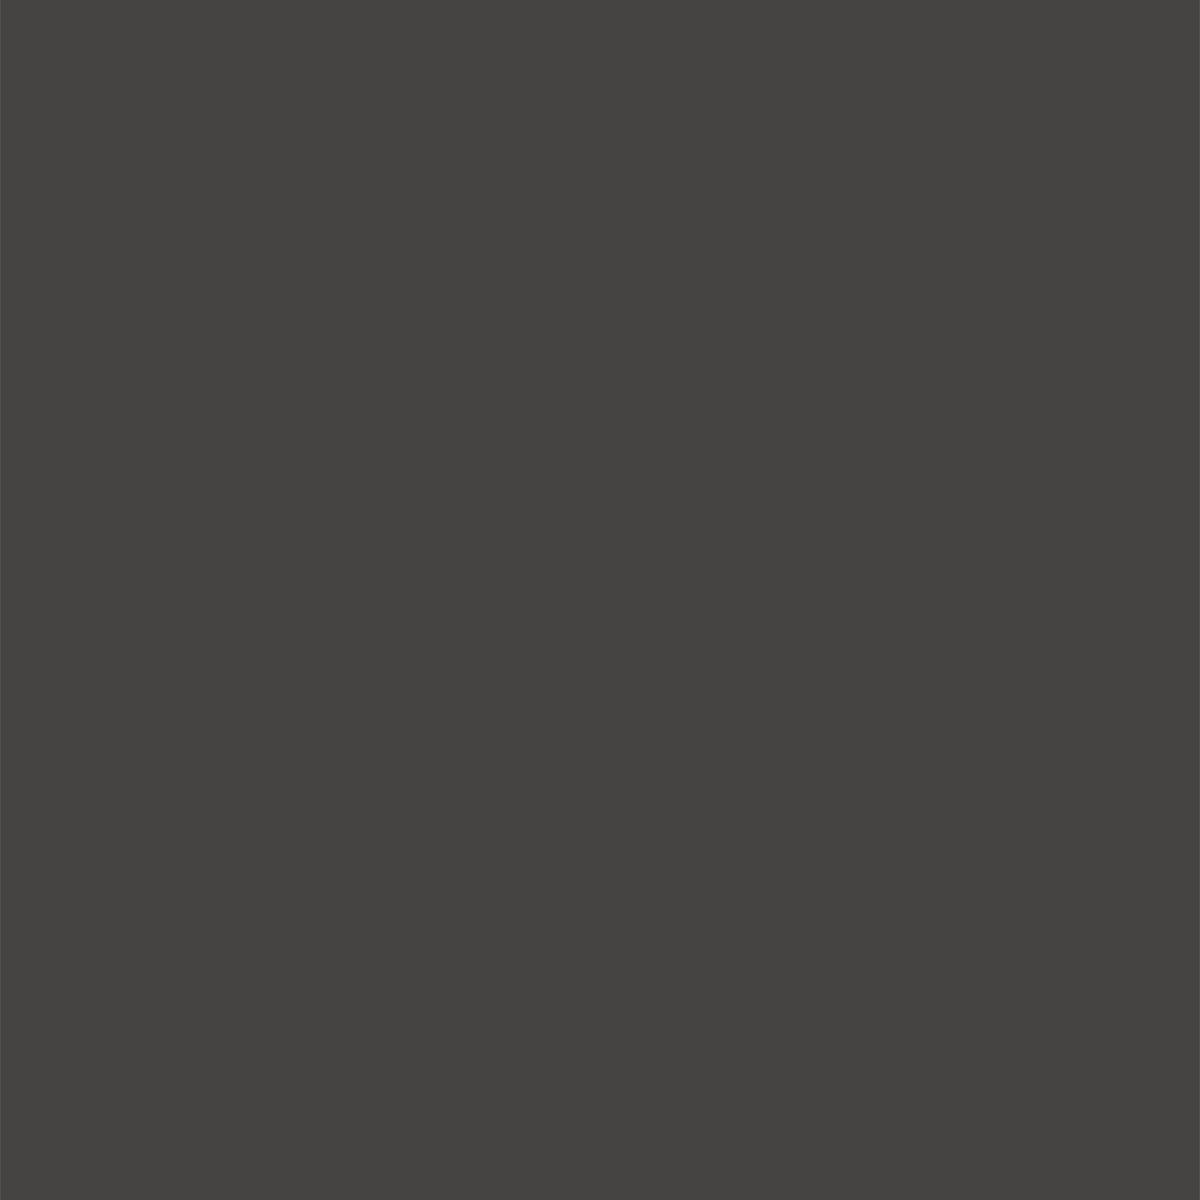 HF1871 Anthrazit